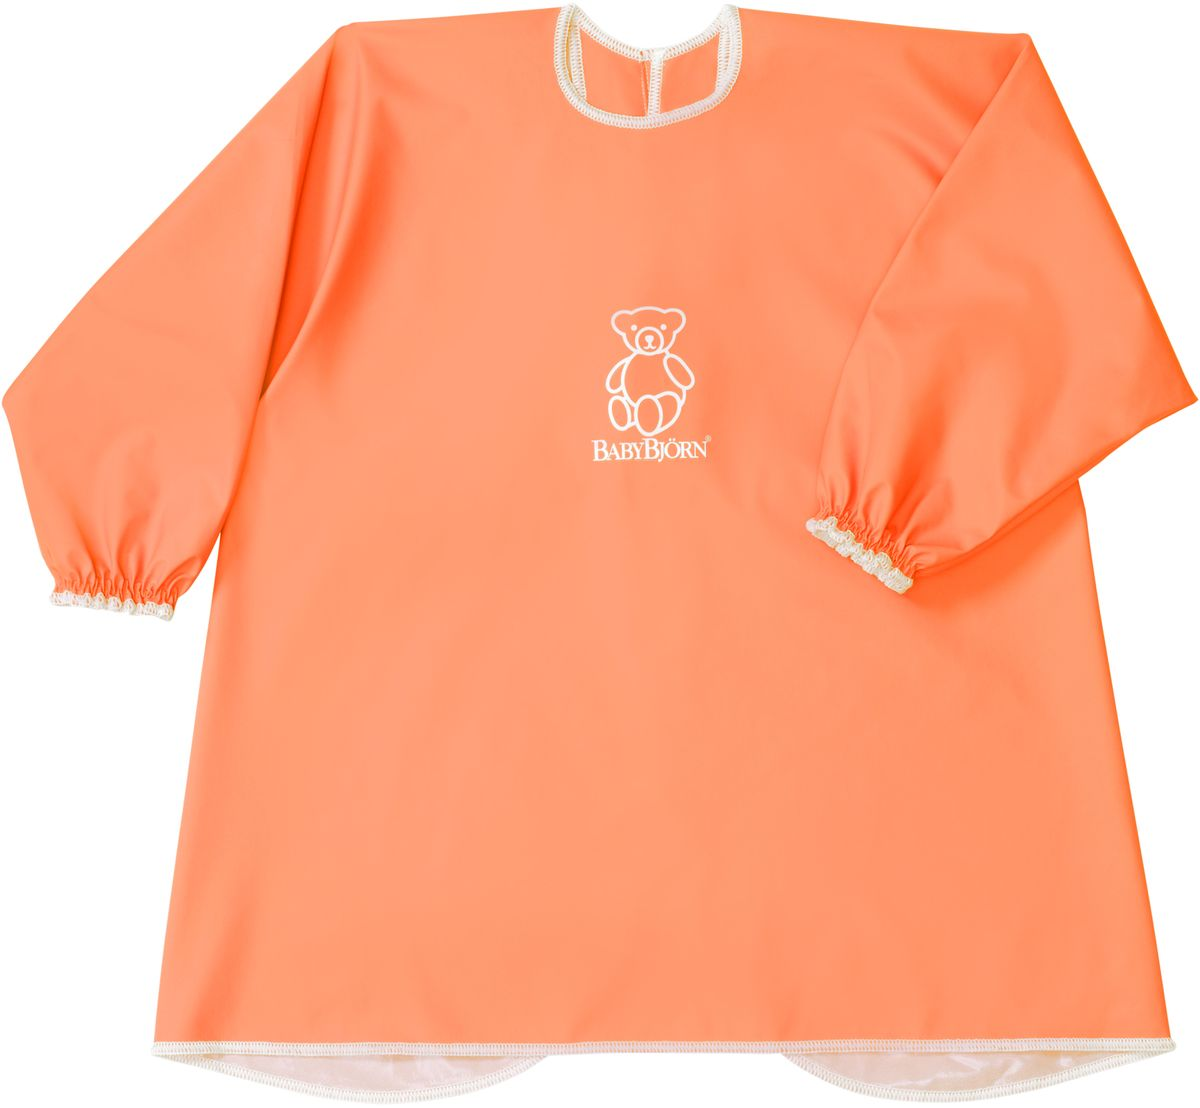 BabyBjorn Рубашка для кормления, цвет: оранжевый babybjorn рубашка для кормления цвет зеленый